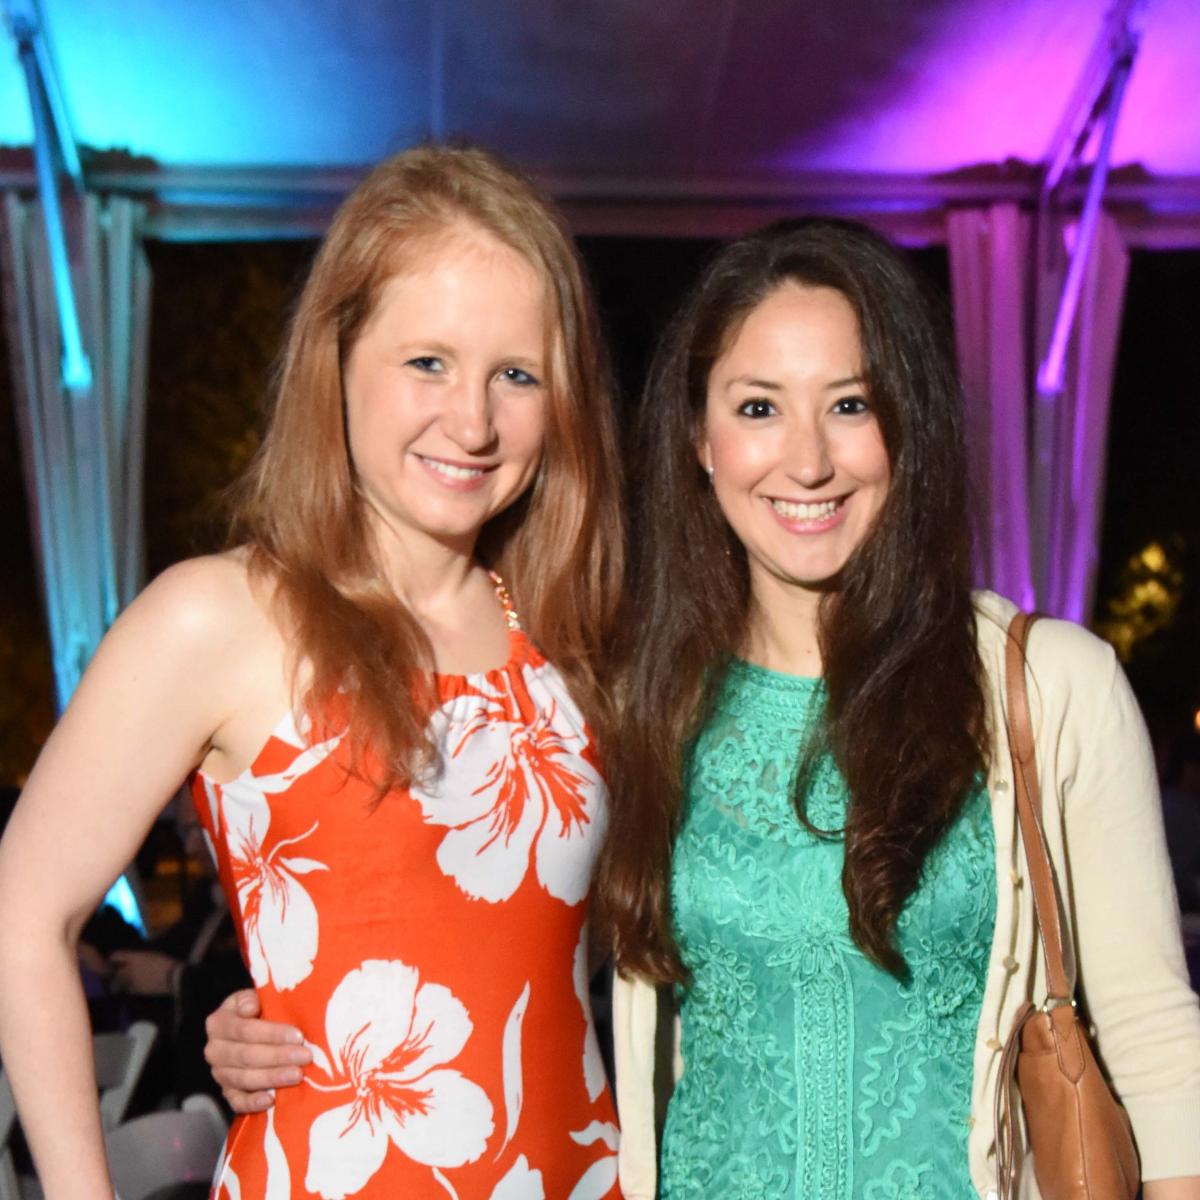 Houston Zoo Ambassadors Gala Sarah O' Shea, Cristina Masson